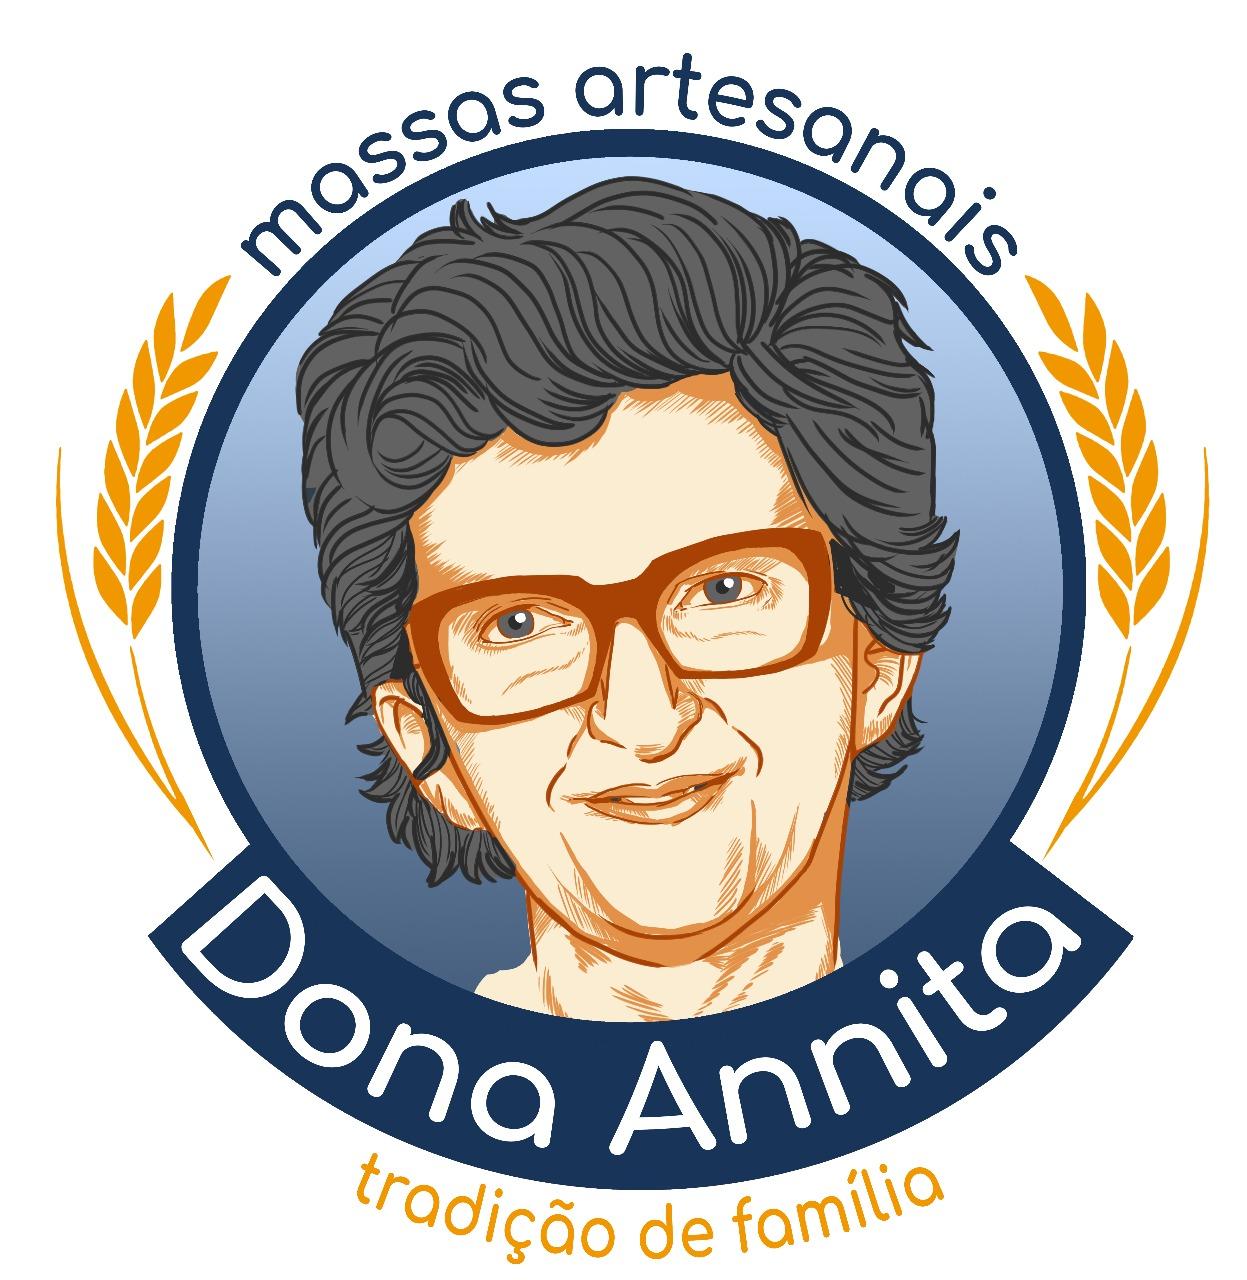 Dona Annita Massas Artesanais